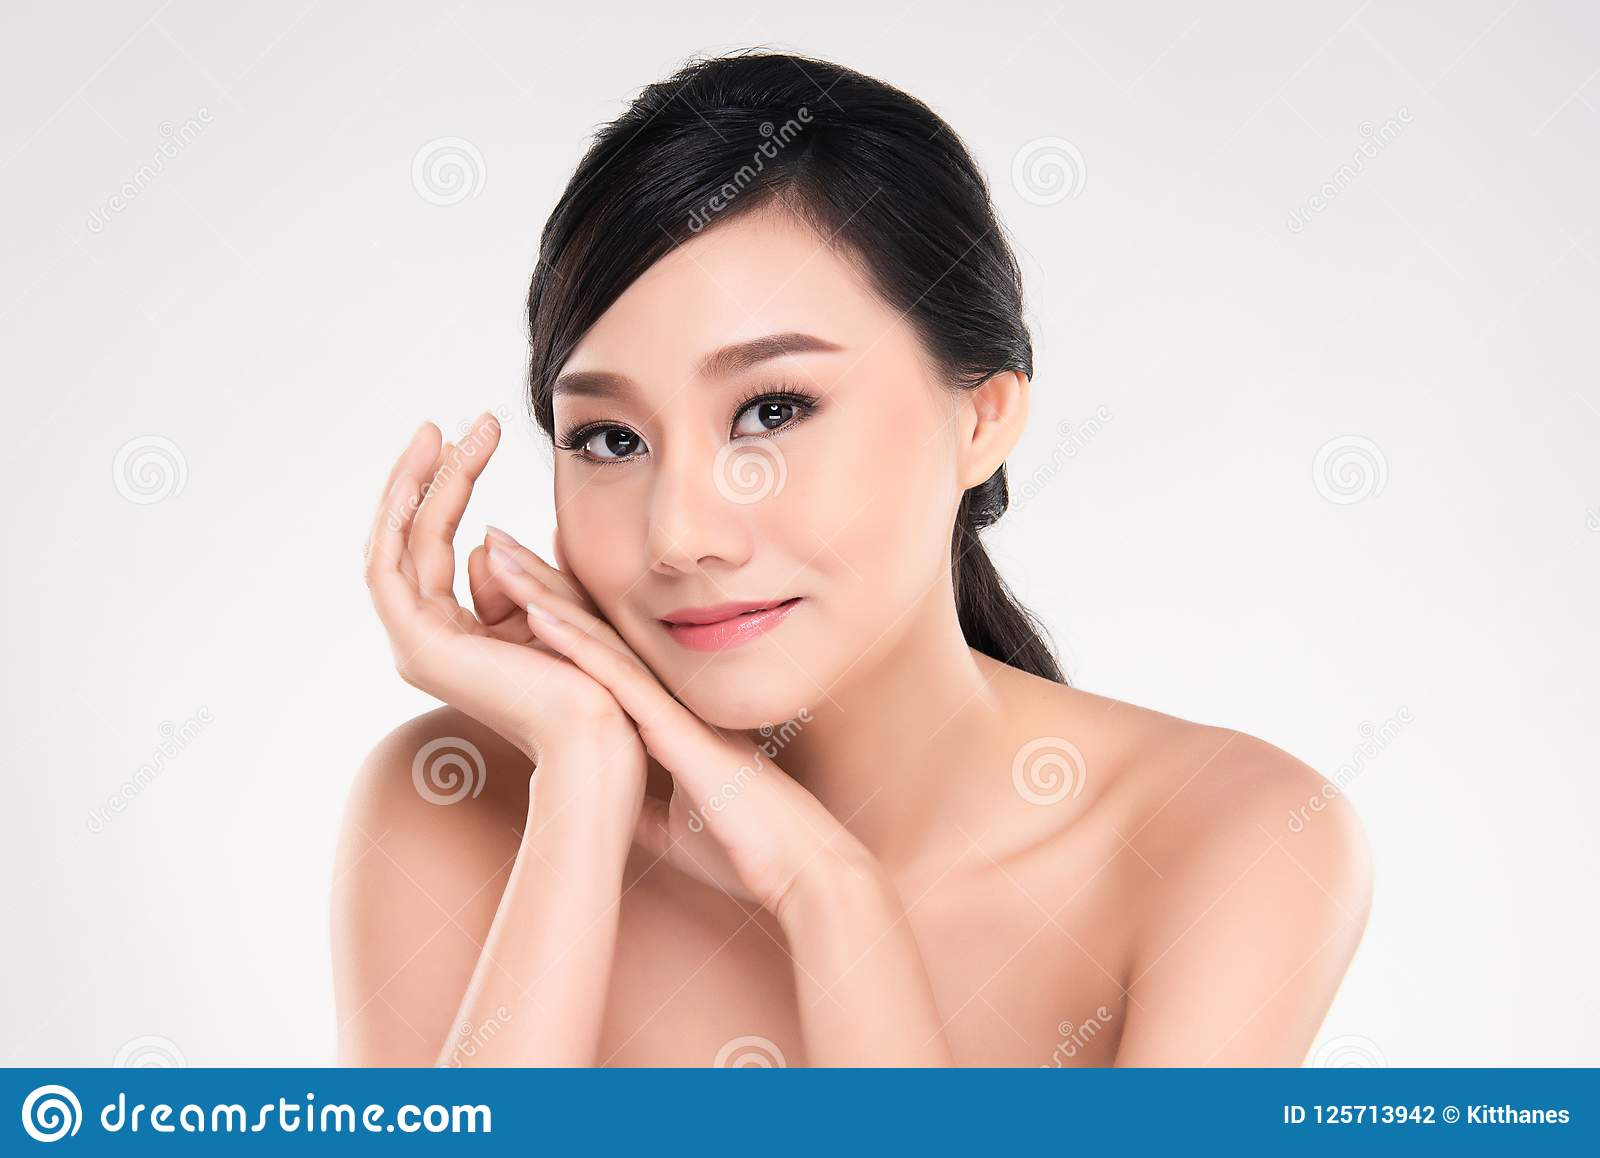 Confirm. agree beauty com facial japanese treatment